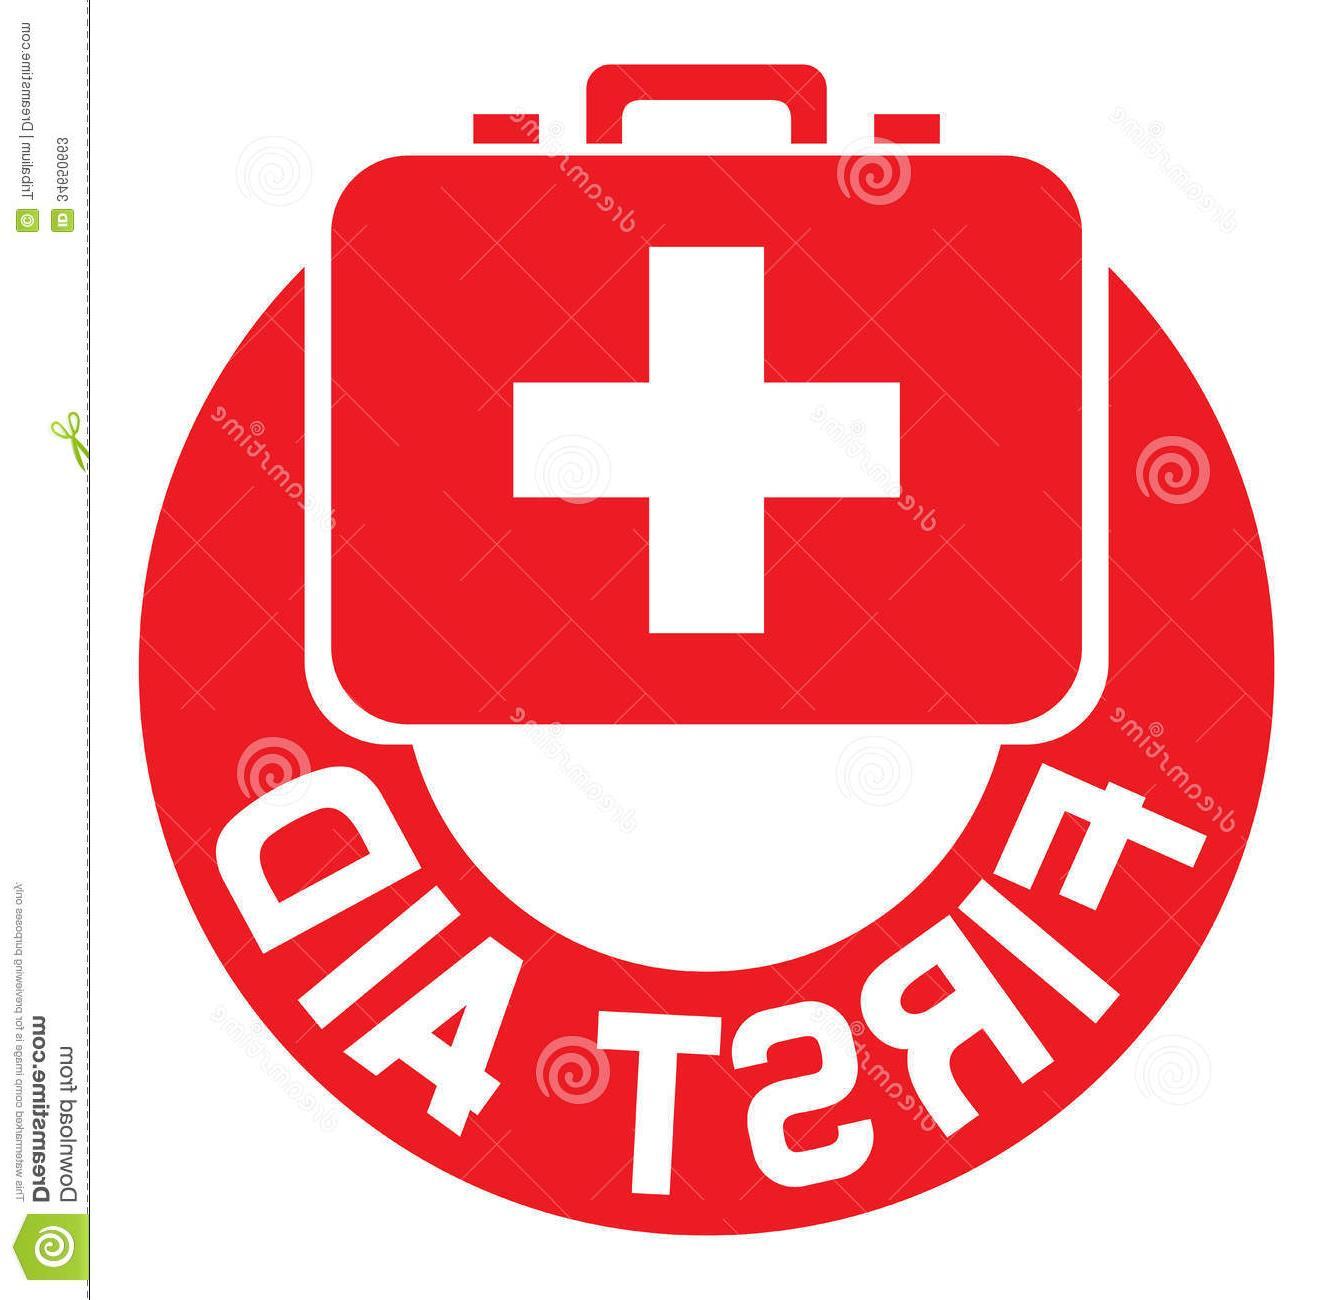 Unique Medical Aid Clipart Cdr.